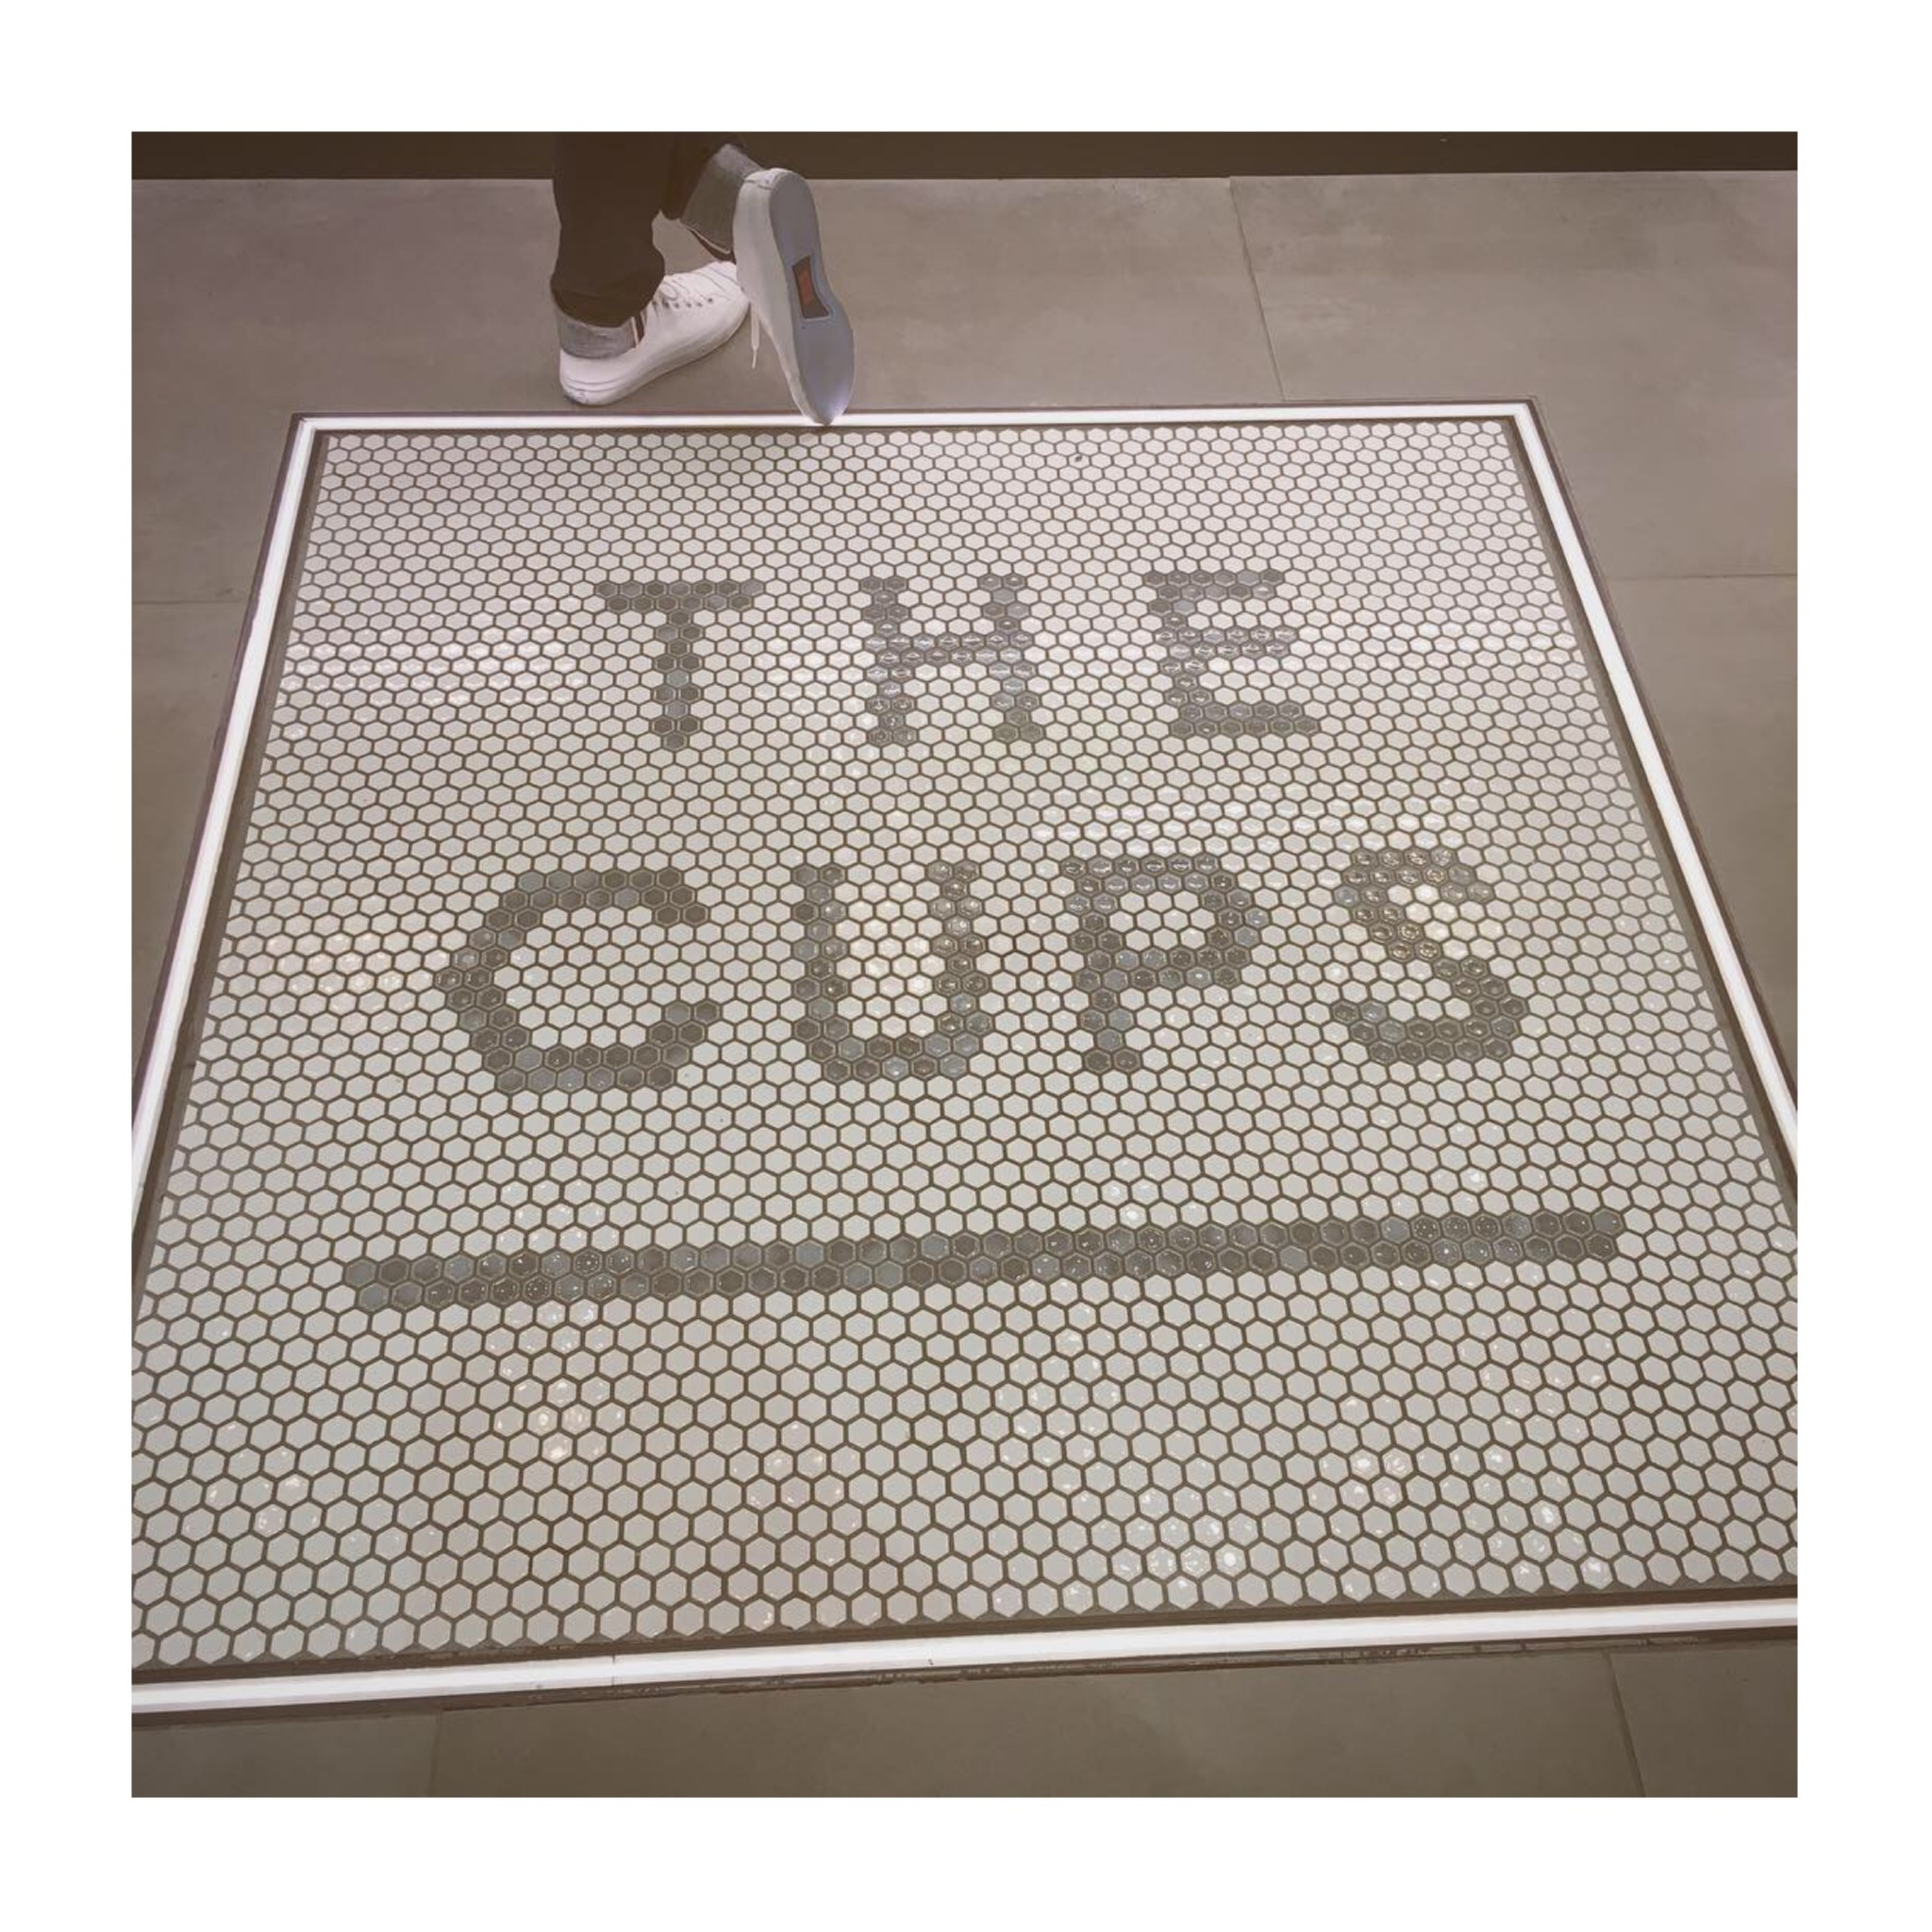 #13【#cafestagram】❤️:《名古屋》名駅すぐ前!のおしゃれカフェ『THE CUPS MEIEKI』☻_3